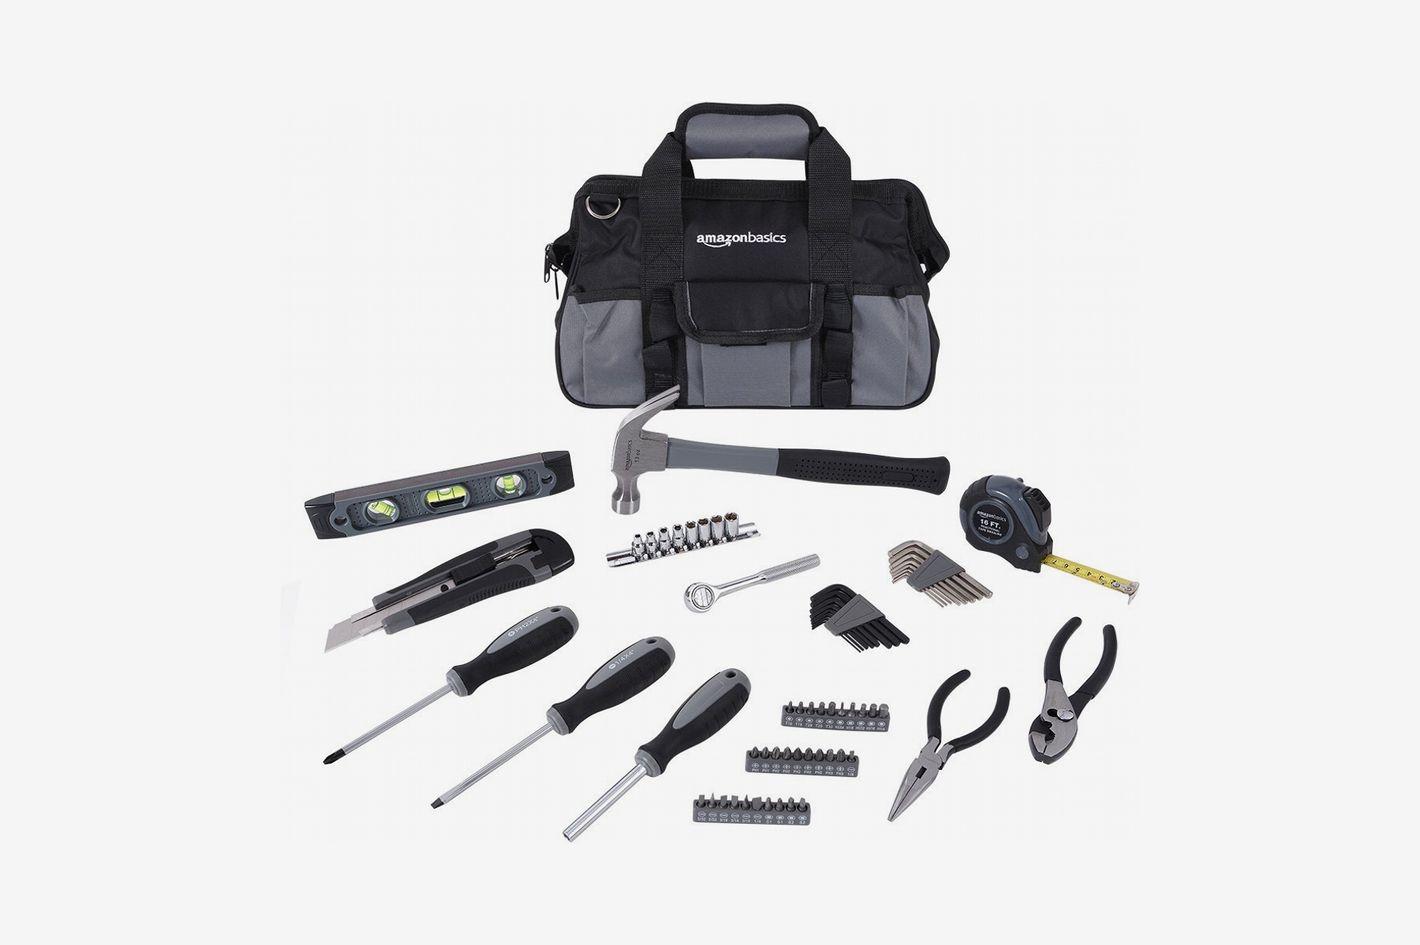 AmazonBasics Home Repair Kit, 65-Piece